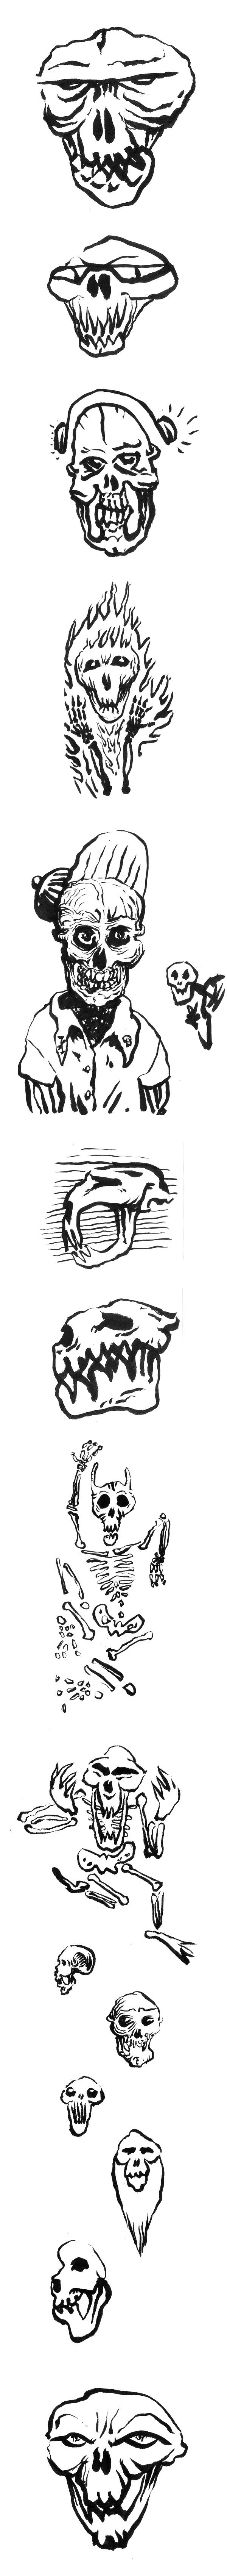 skull,Left hand,sketches